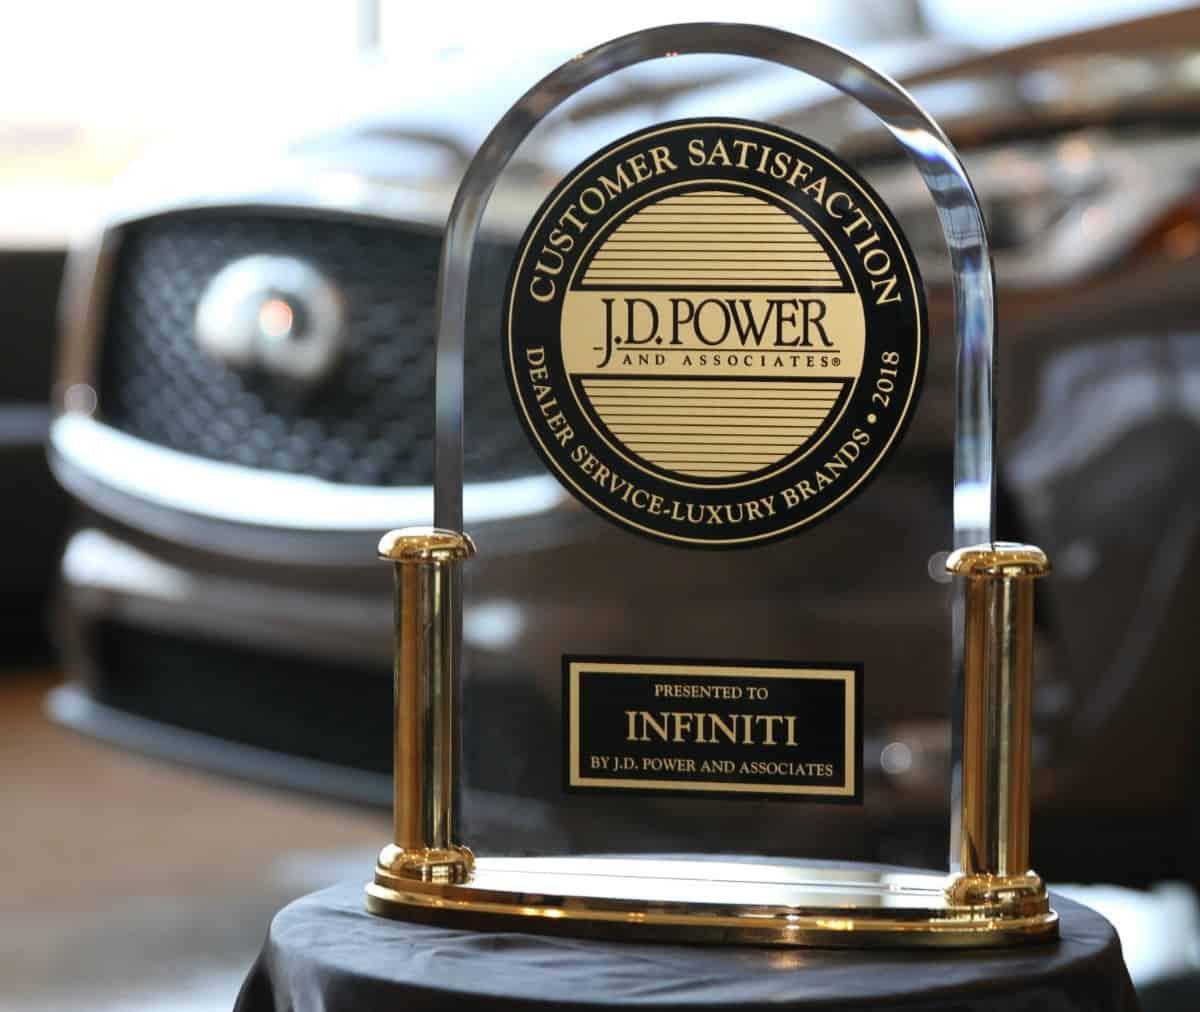 Infiniti J D Power customer satisfaction award